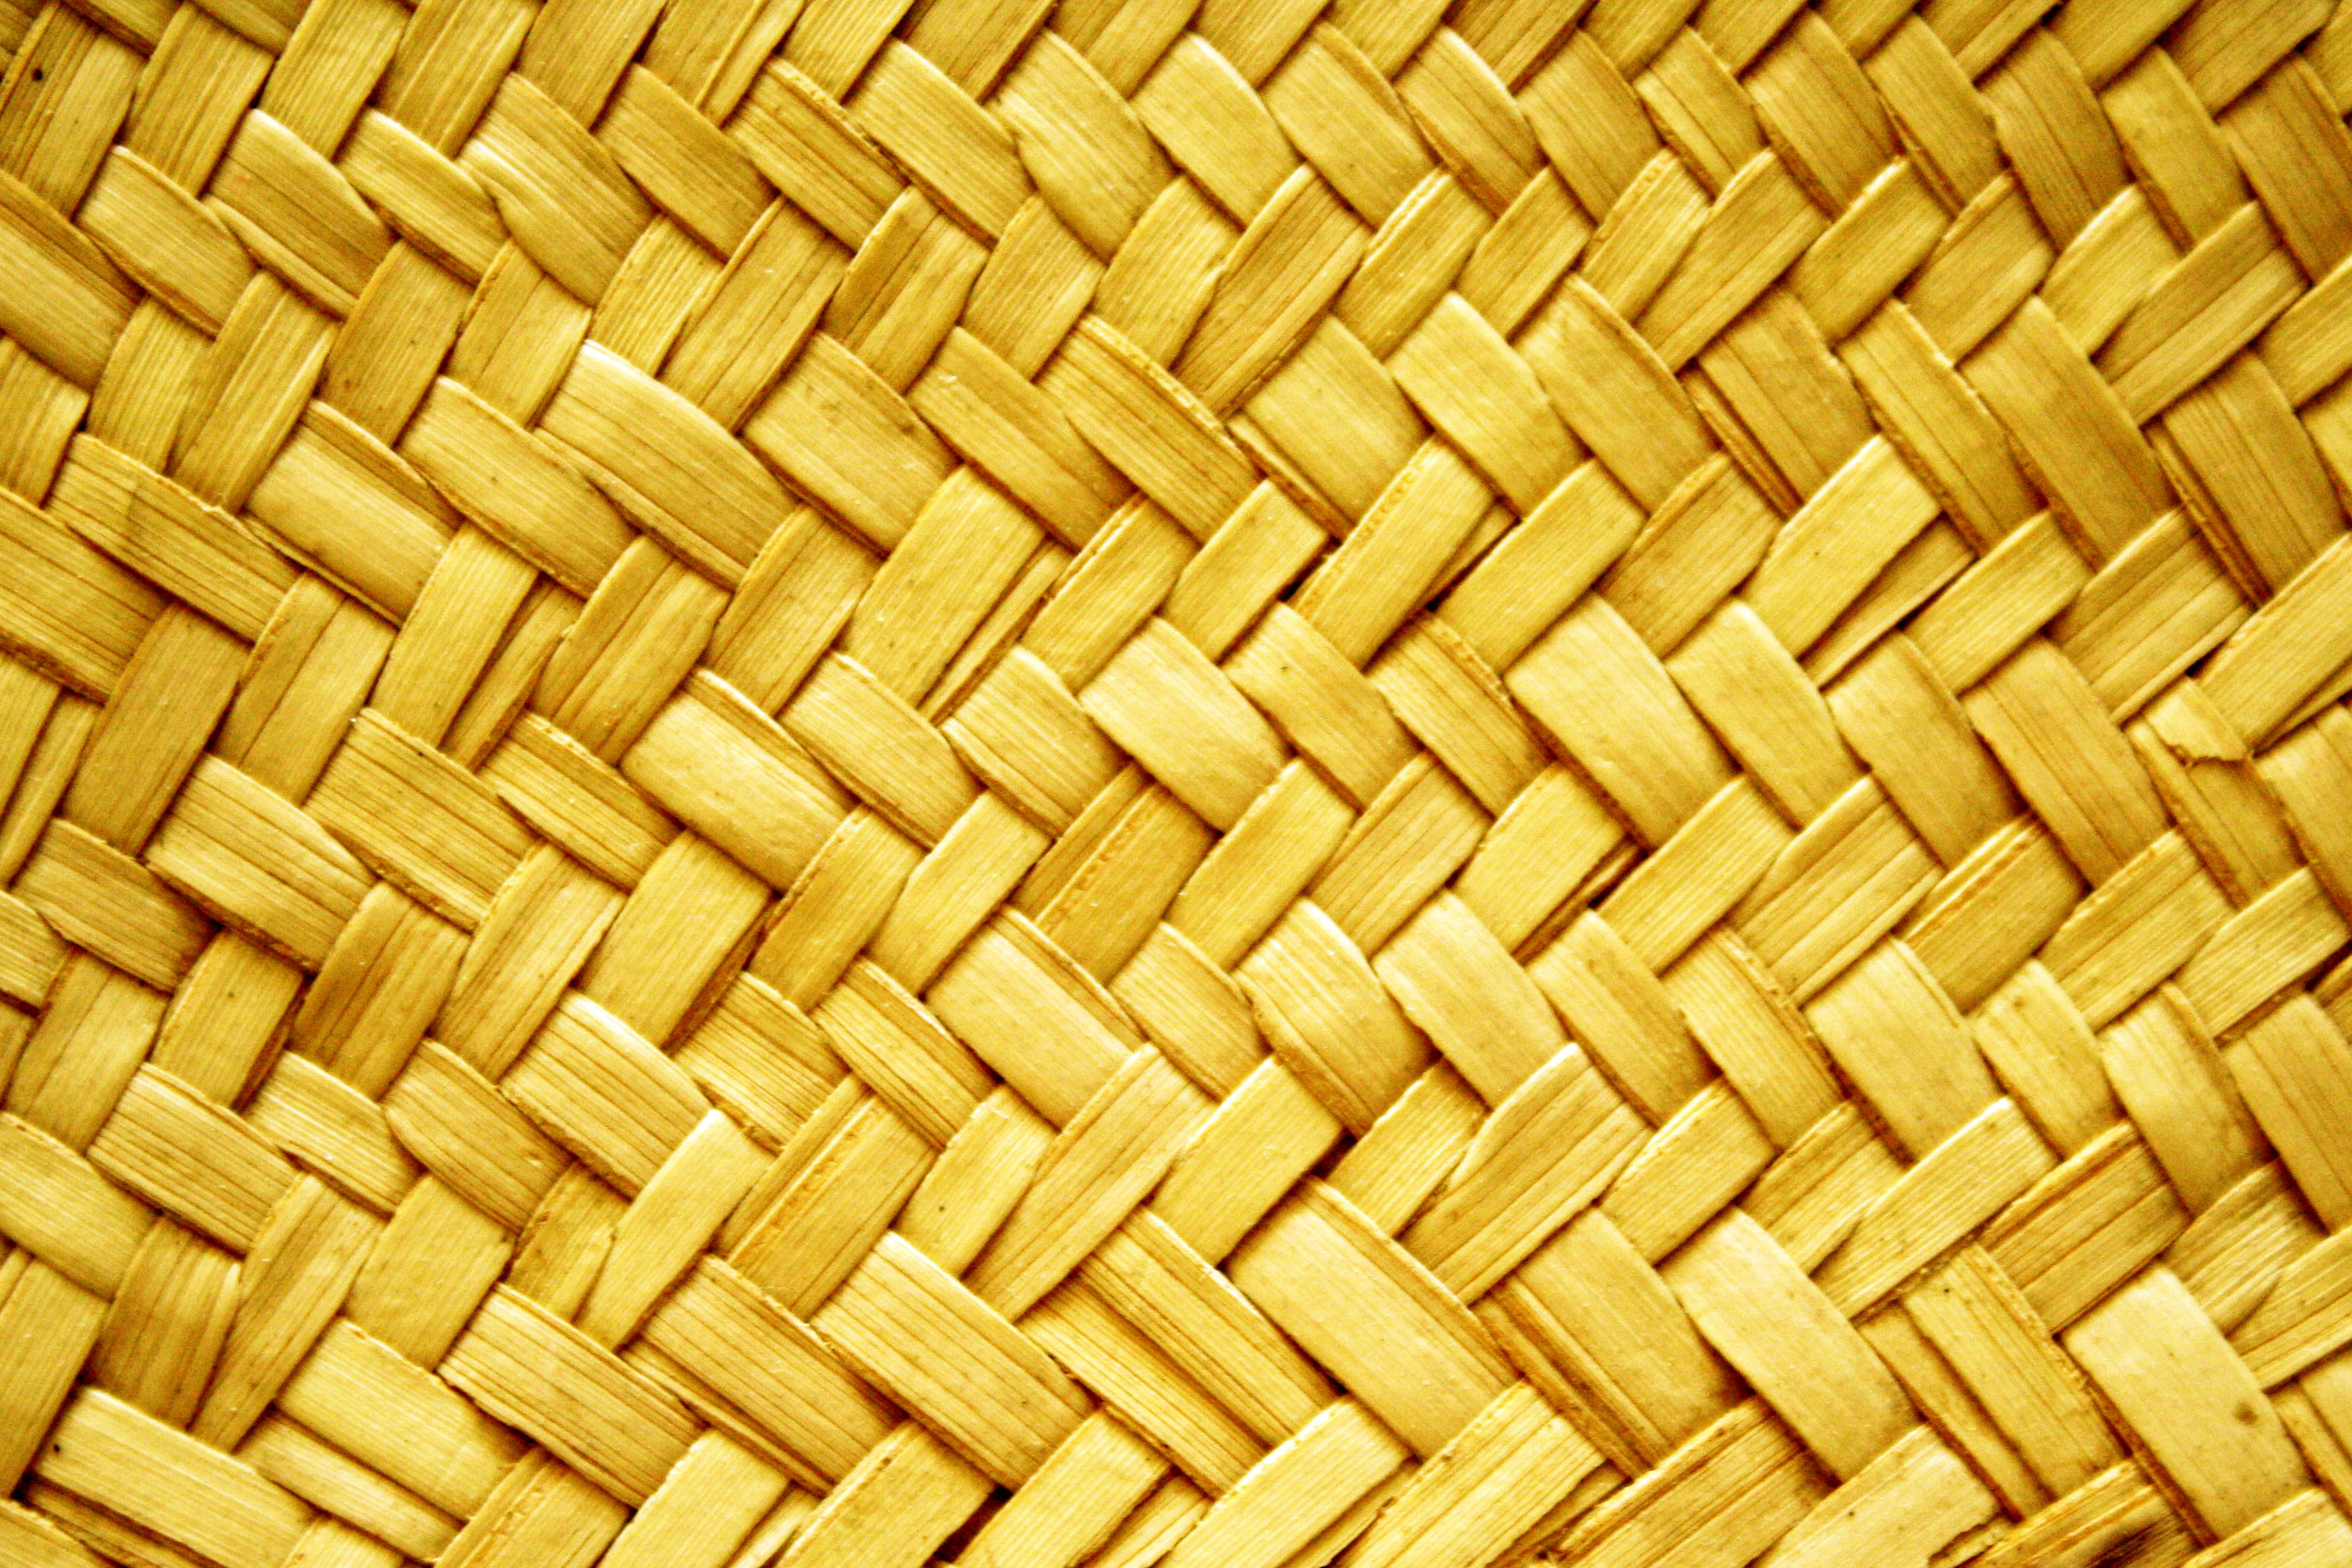 p old hassira hasira vintage mat rug mats berber moroccan straw kilim fullxfull carpet il